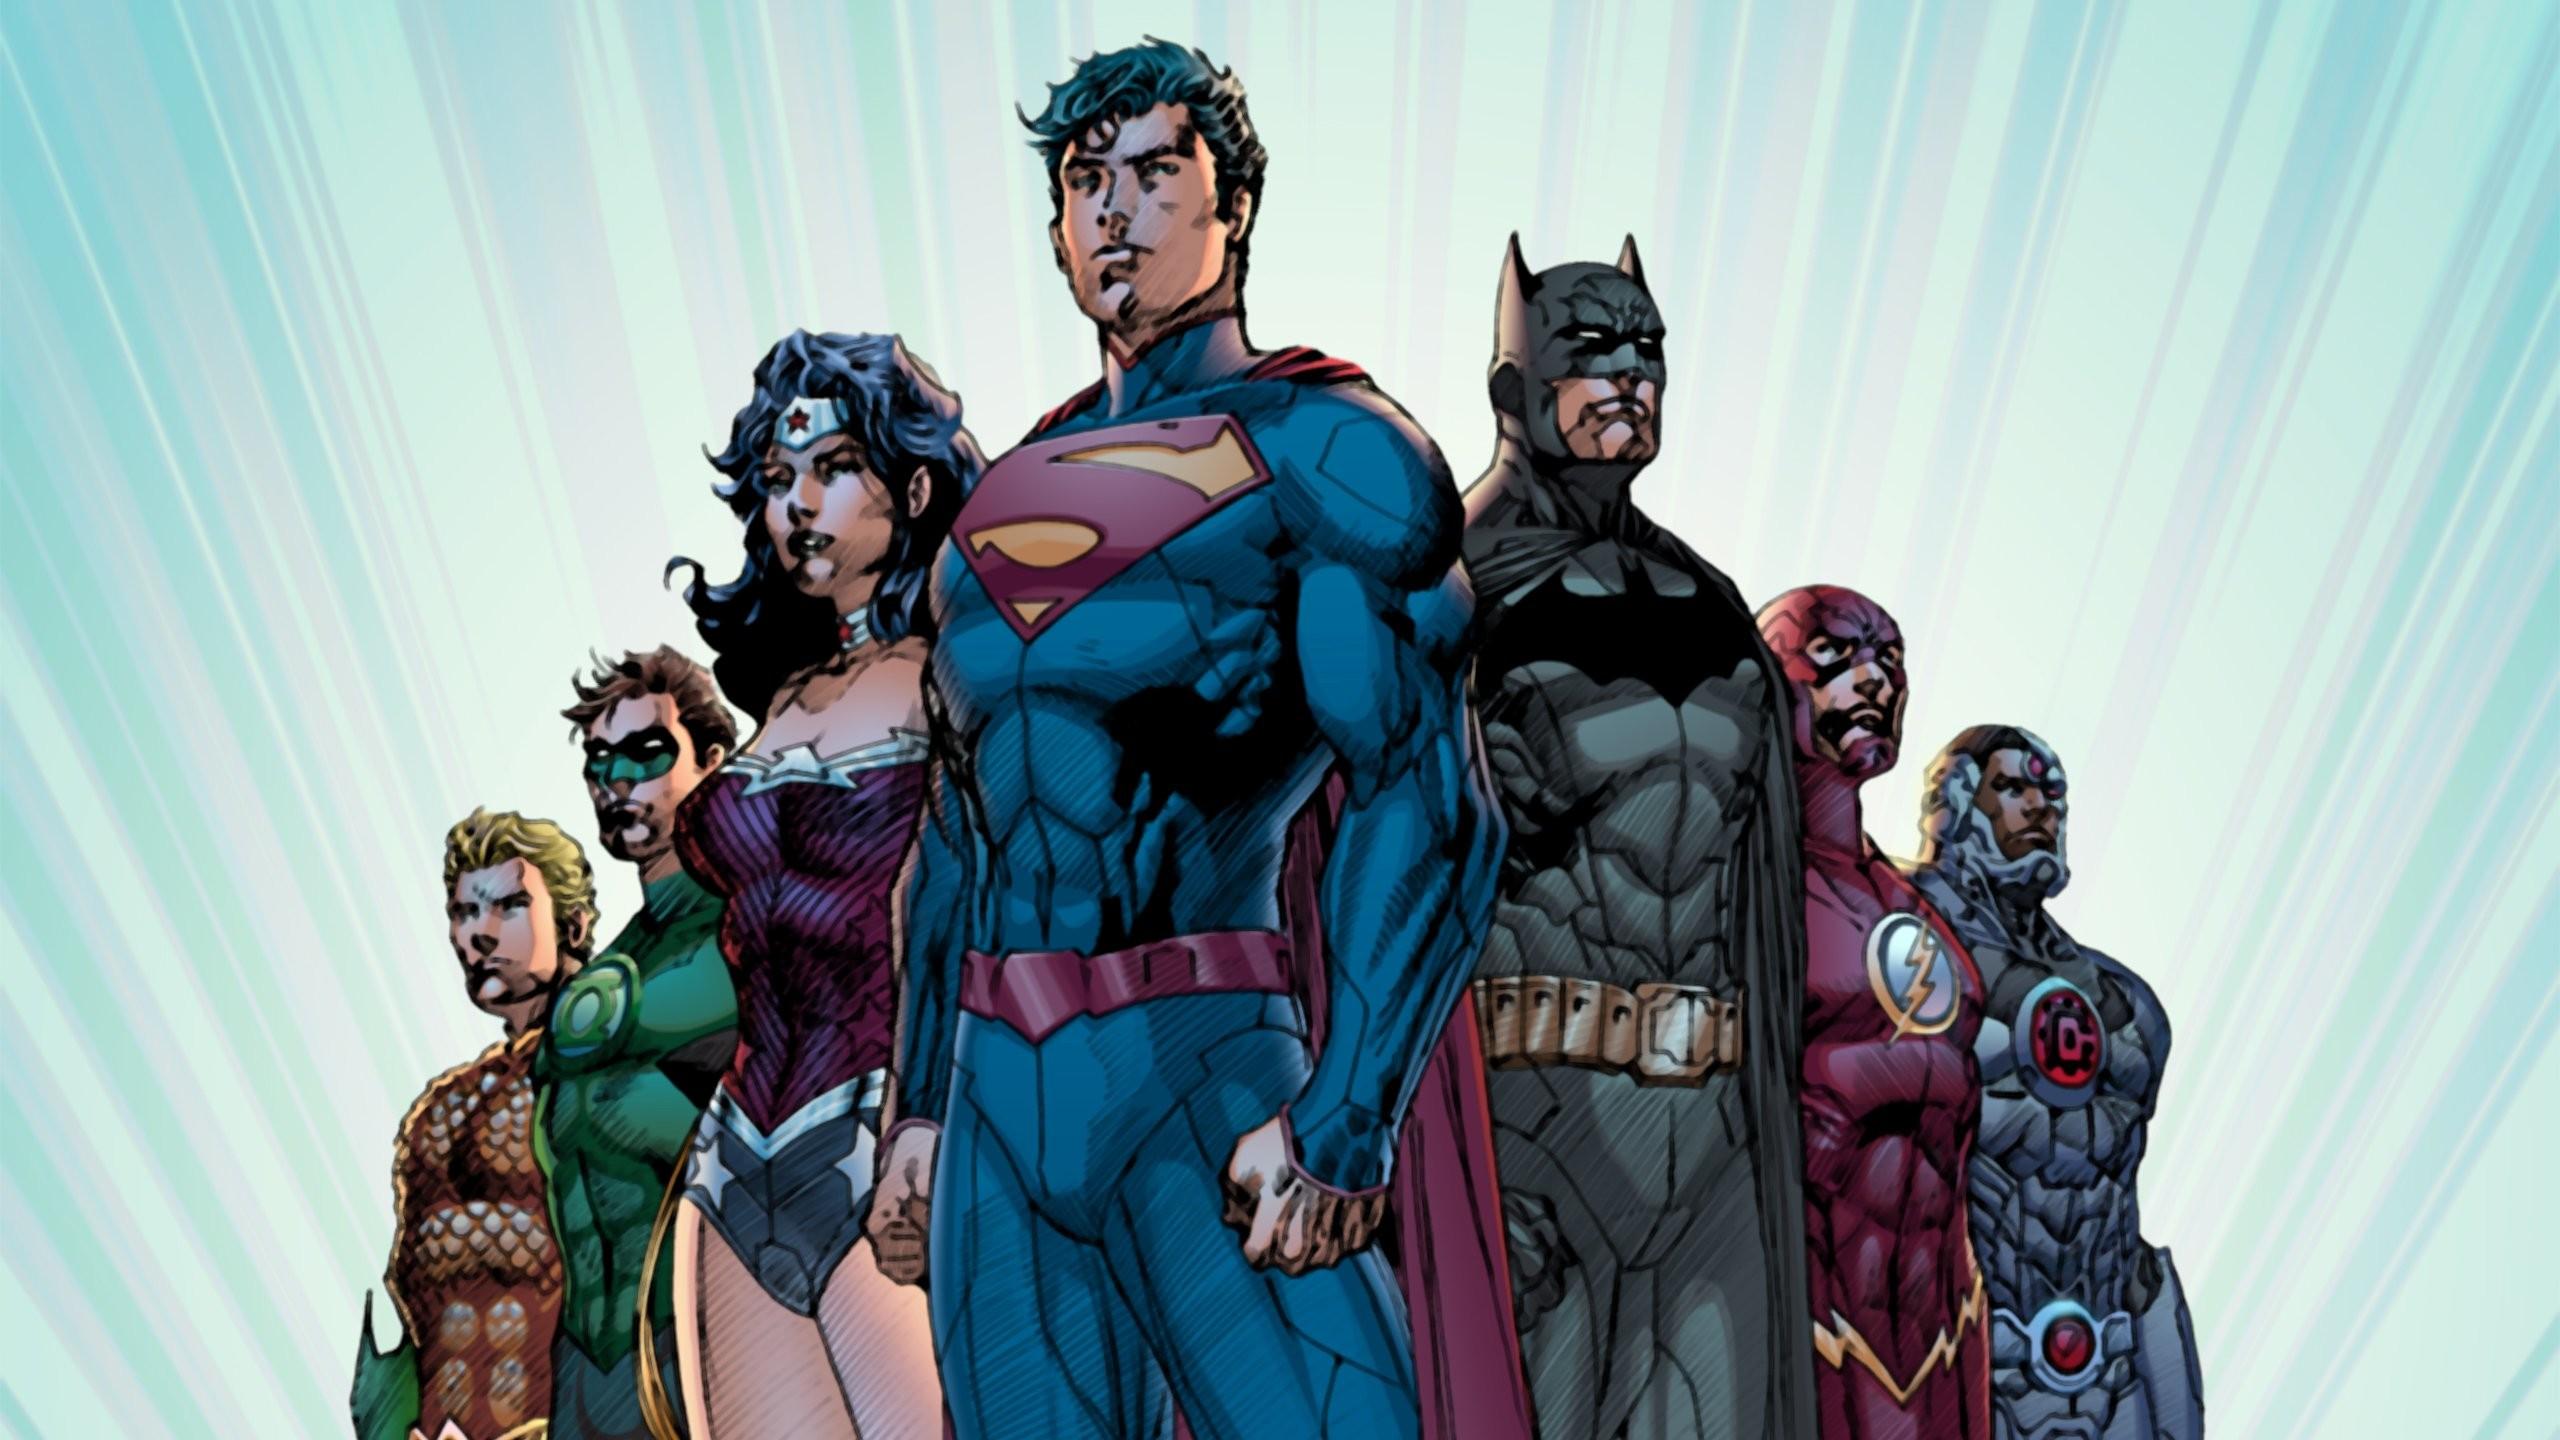 New 52 Justice League Superman Batman Wonder Woman wallpaper .